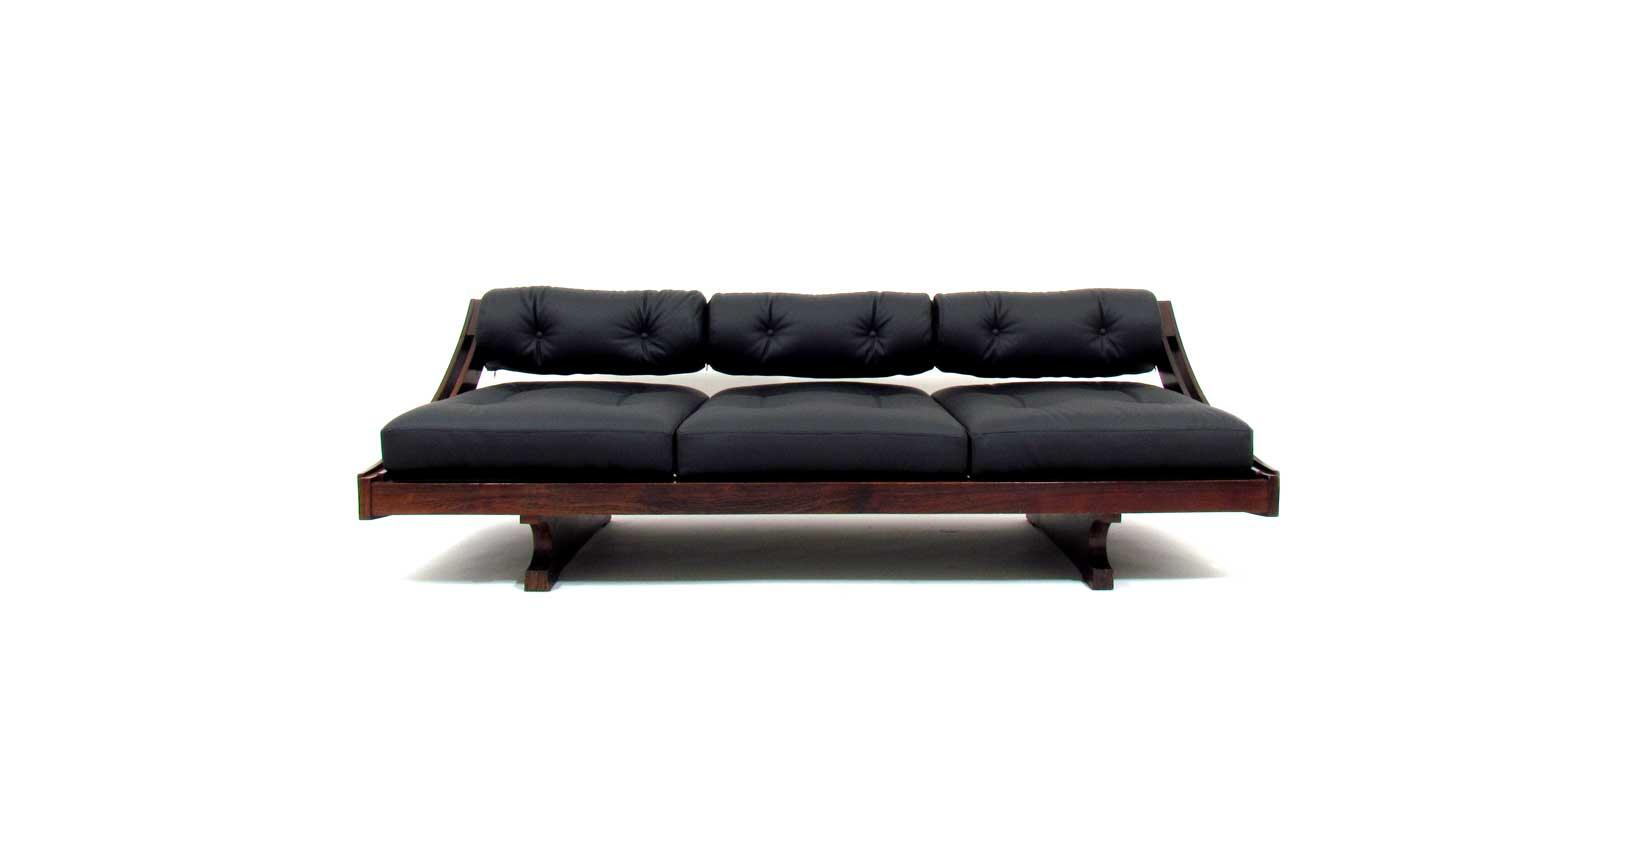 sormani gianni songia gs195 divano sofa sofabed leather vintage iconic design furniture